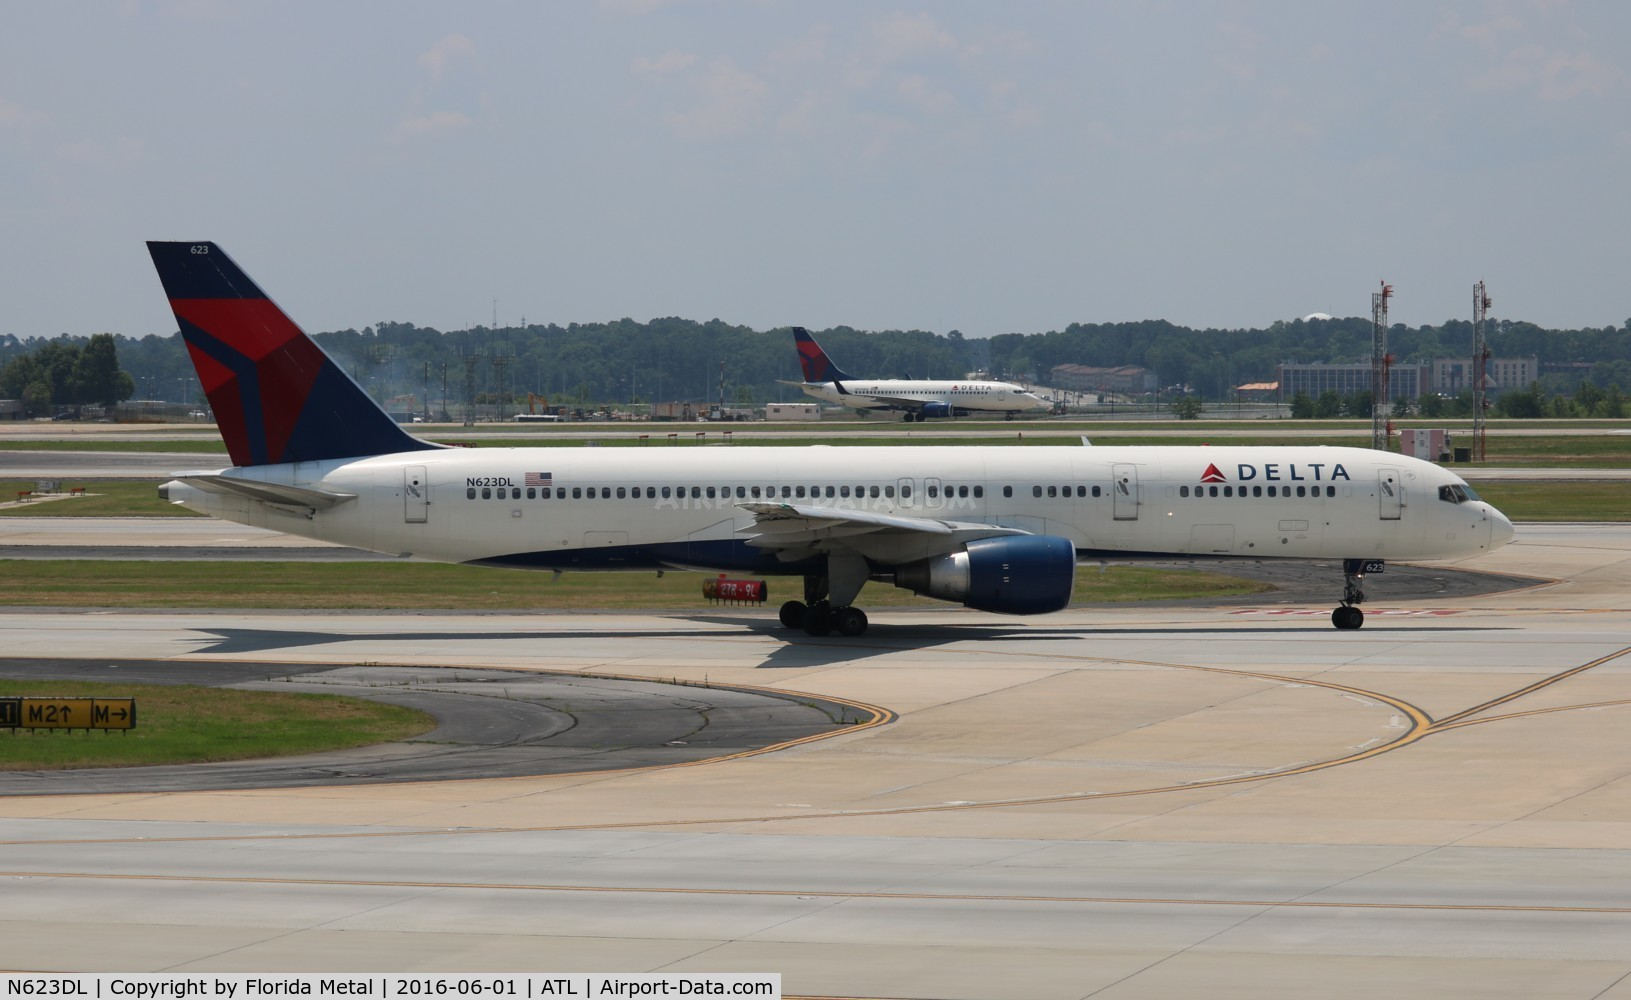 N623DL, 1987 Boeing 757-232 C/N 22913, Delta